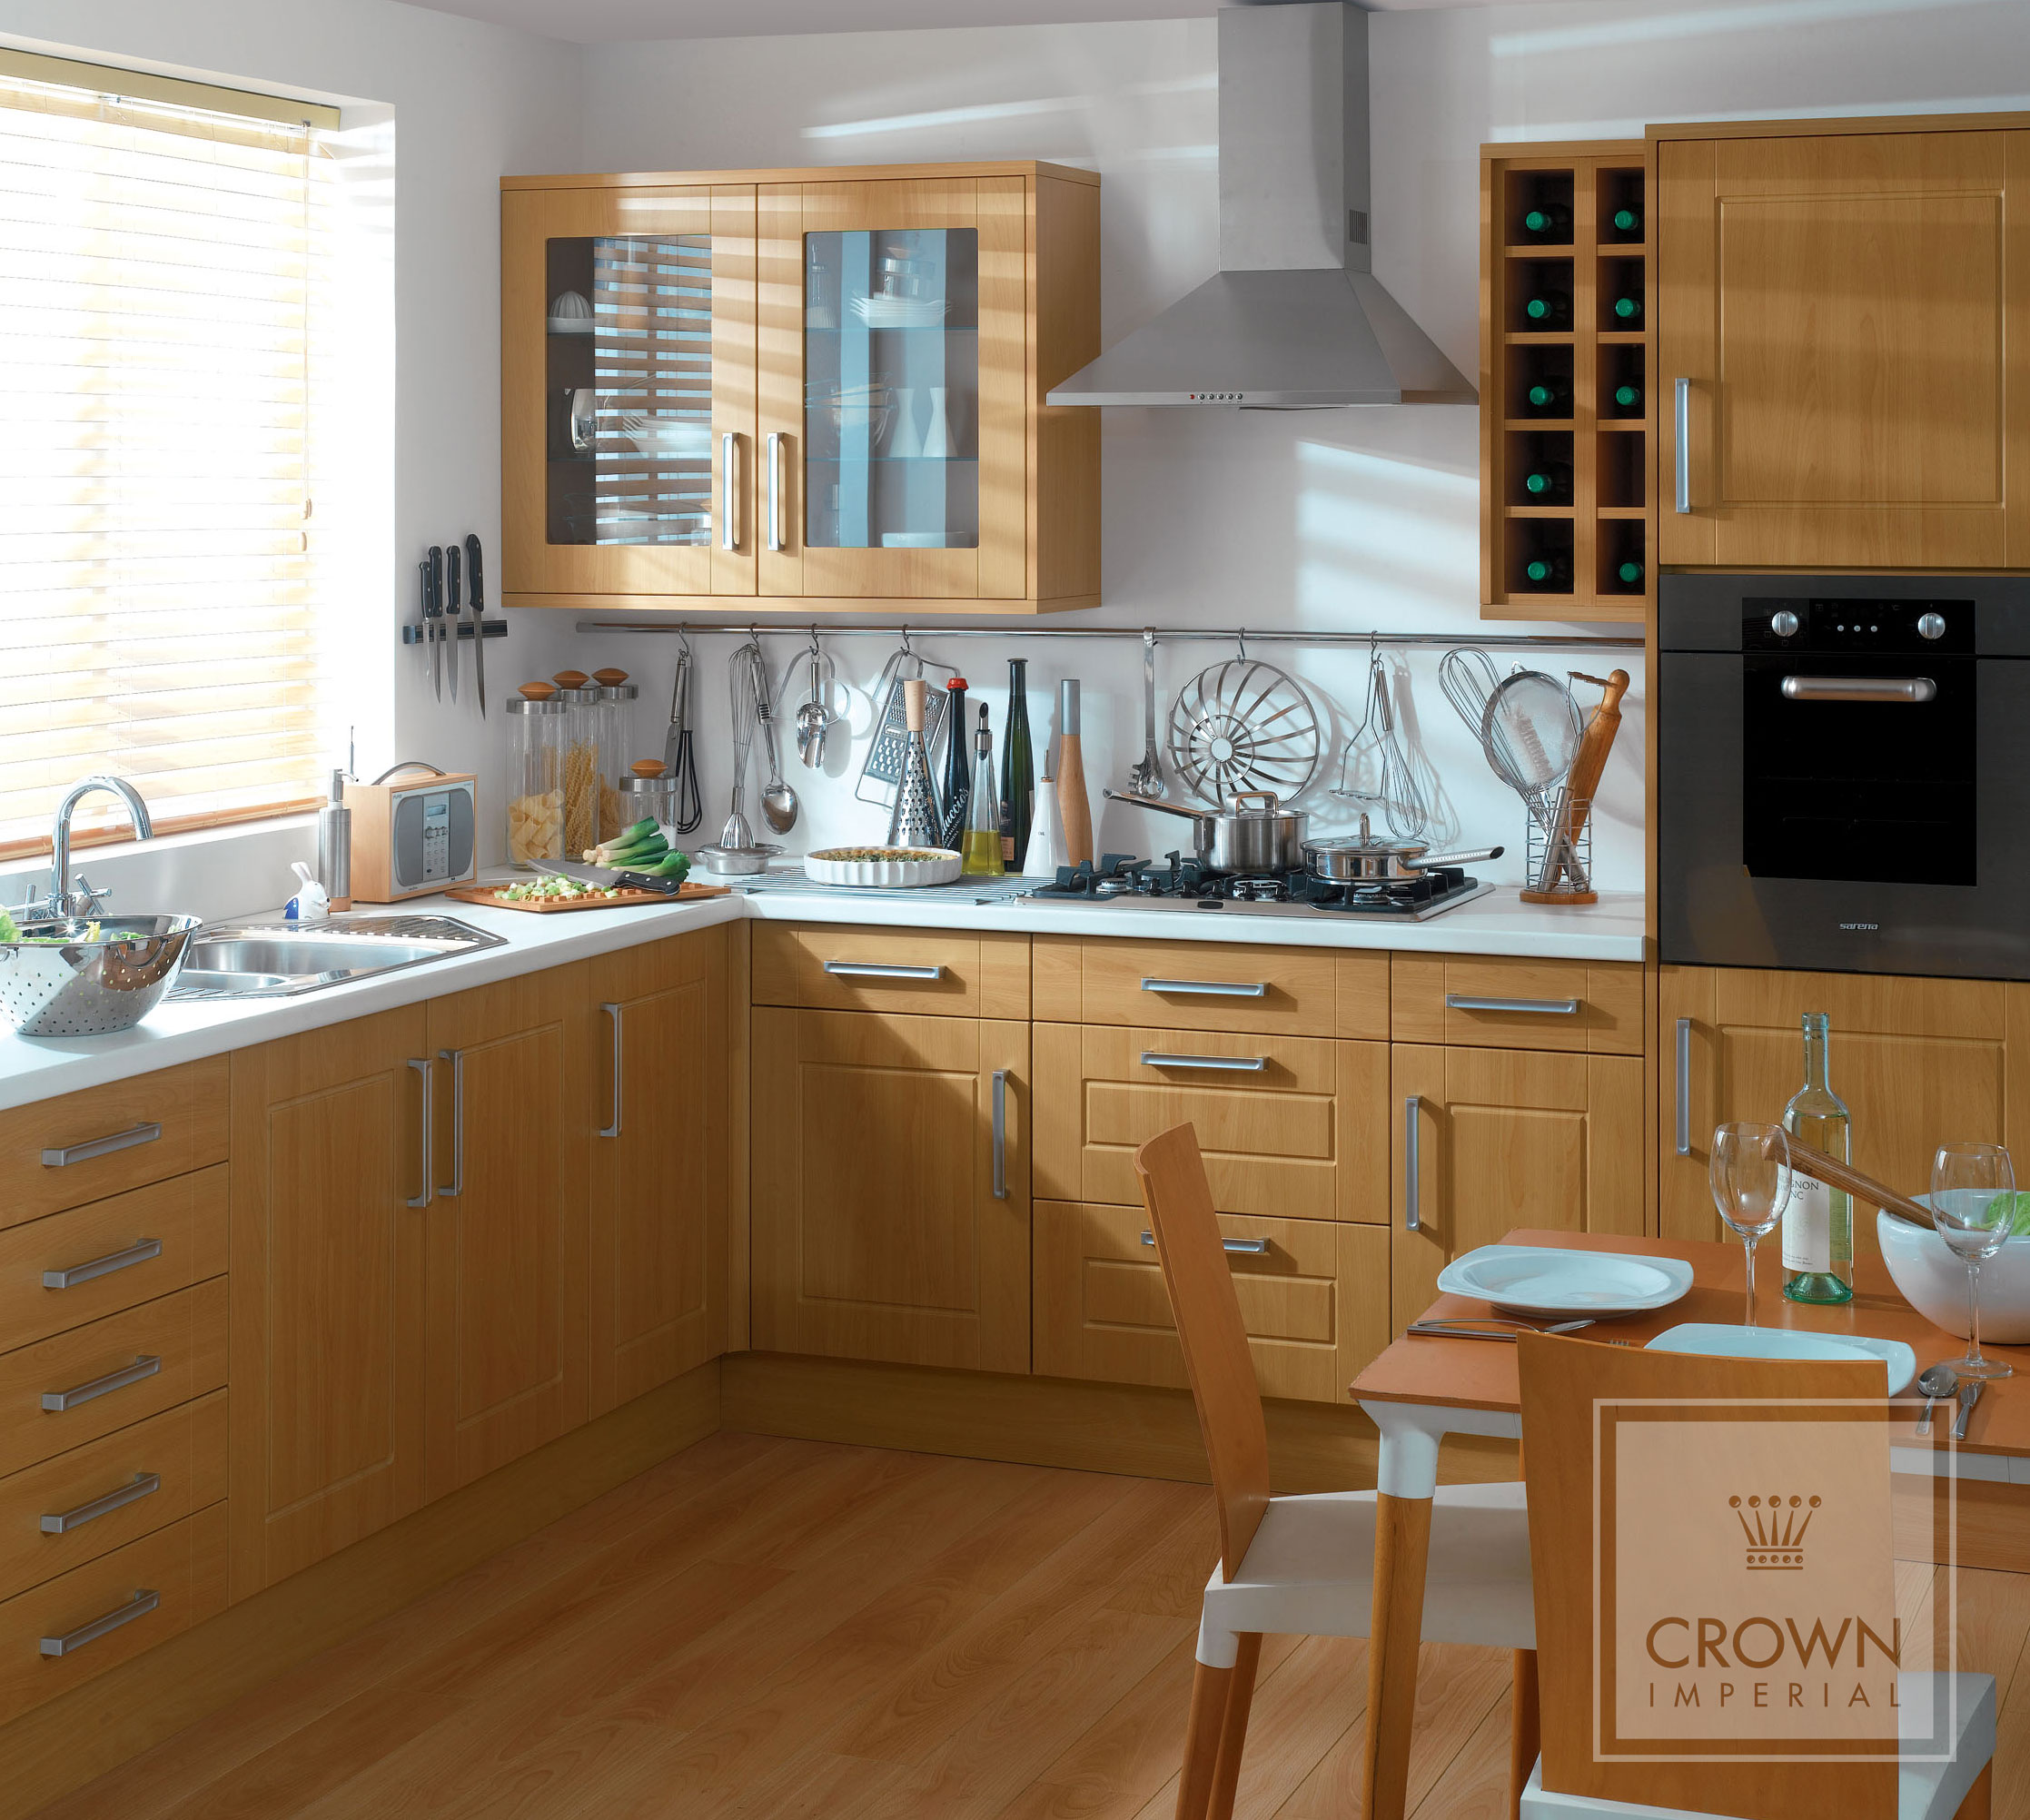 Lifestyle Designs - The Skipton Kitchen Company